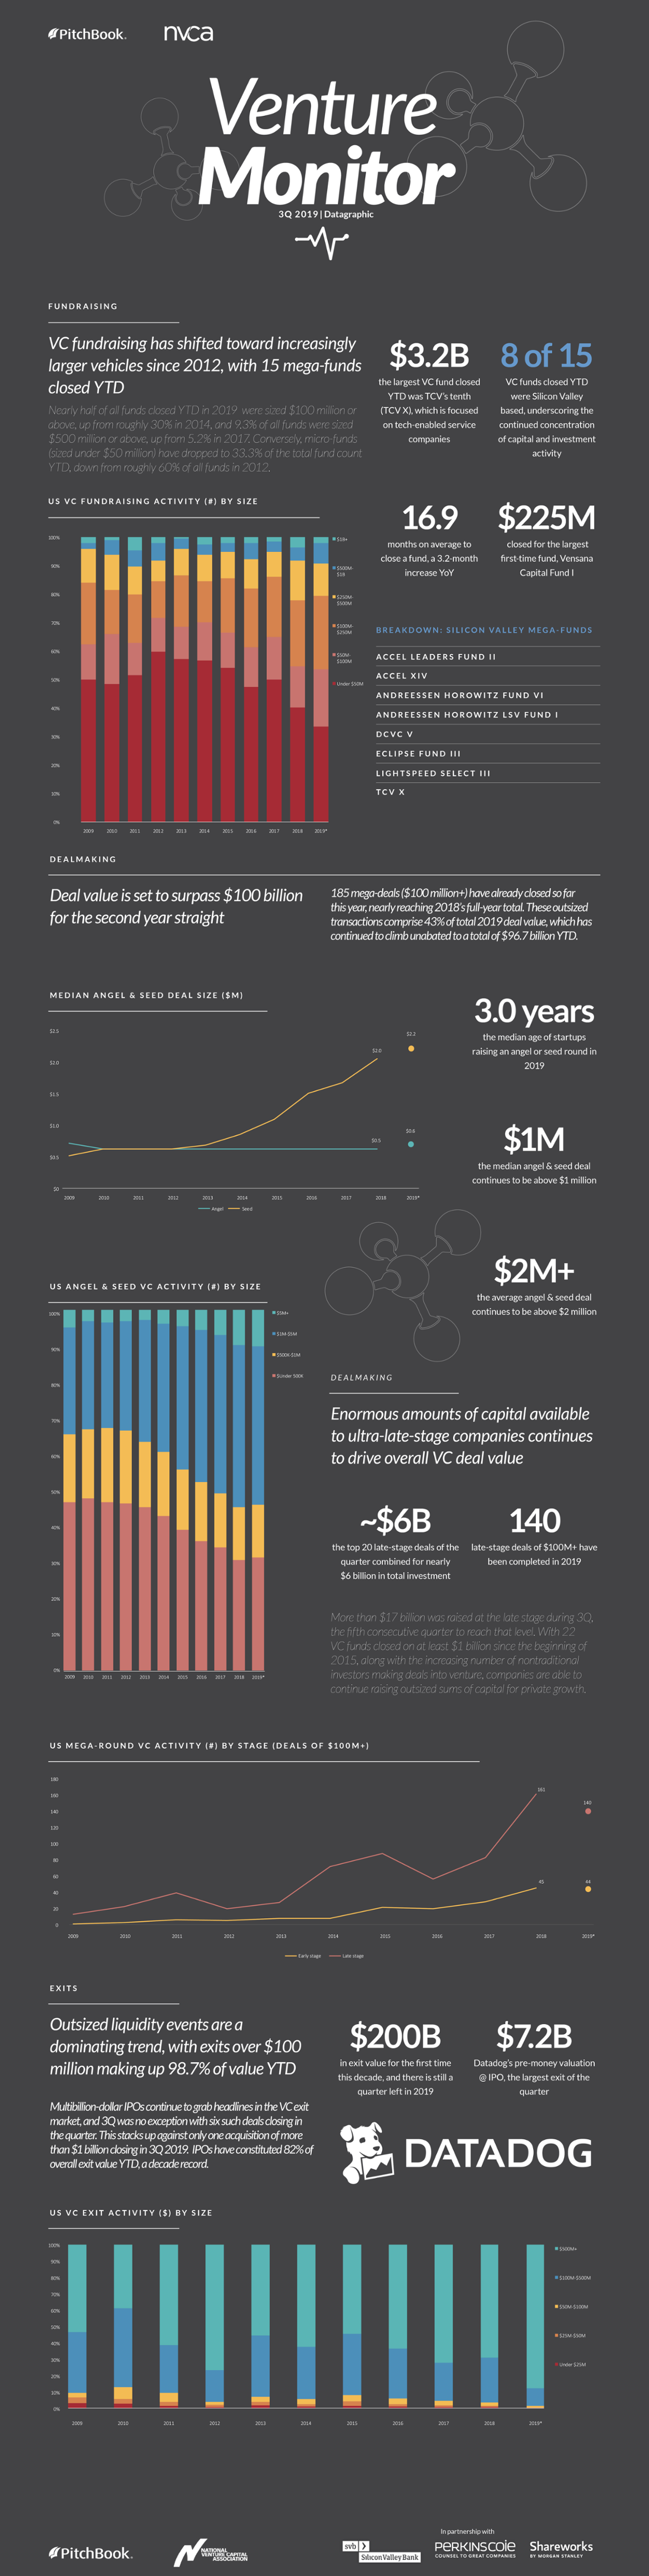 Venture Monitor 3Q 2019 Datagraphic #Infographic